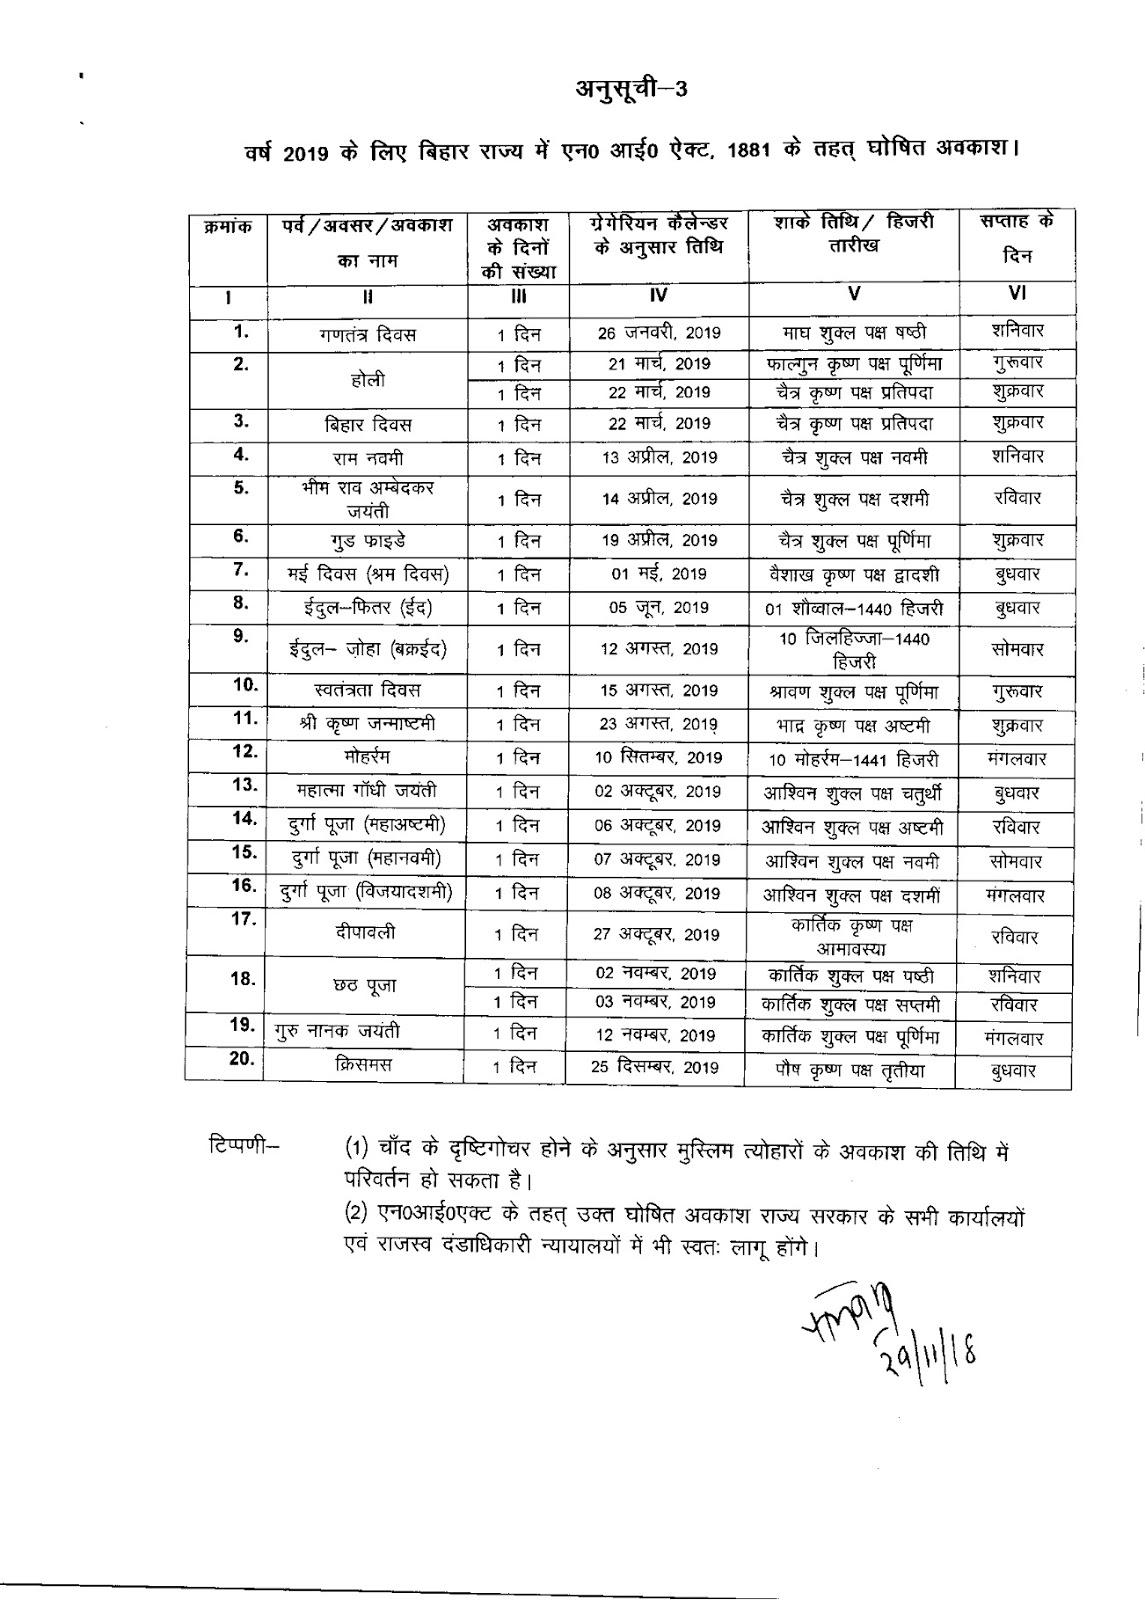 Bihar Government Calendar 2019 #educratsweb throughout 2020 Calendar Bihar